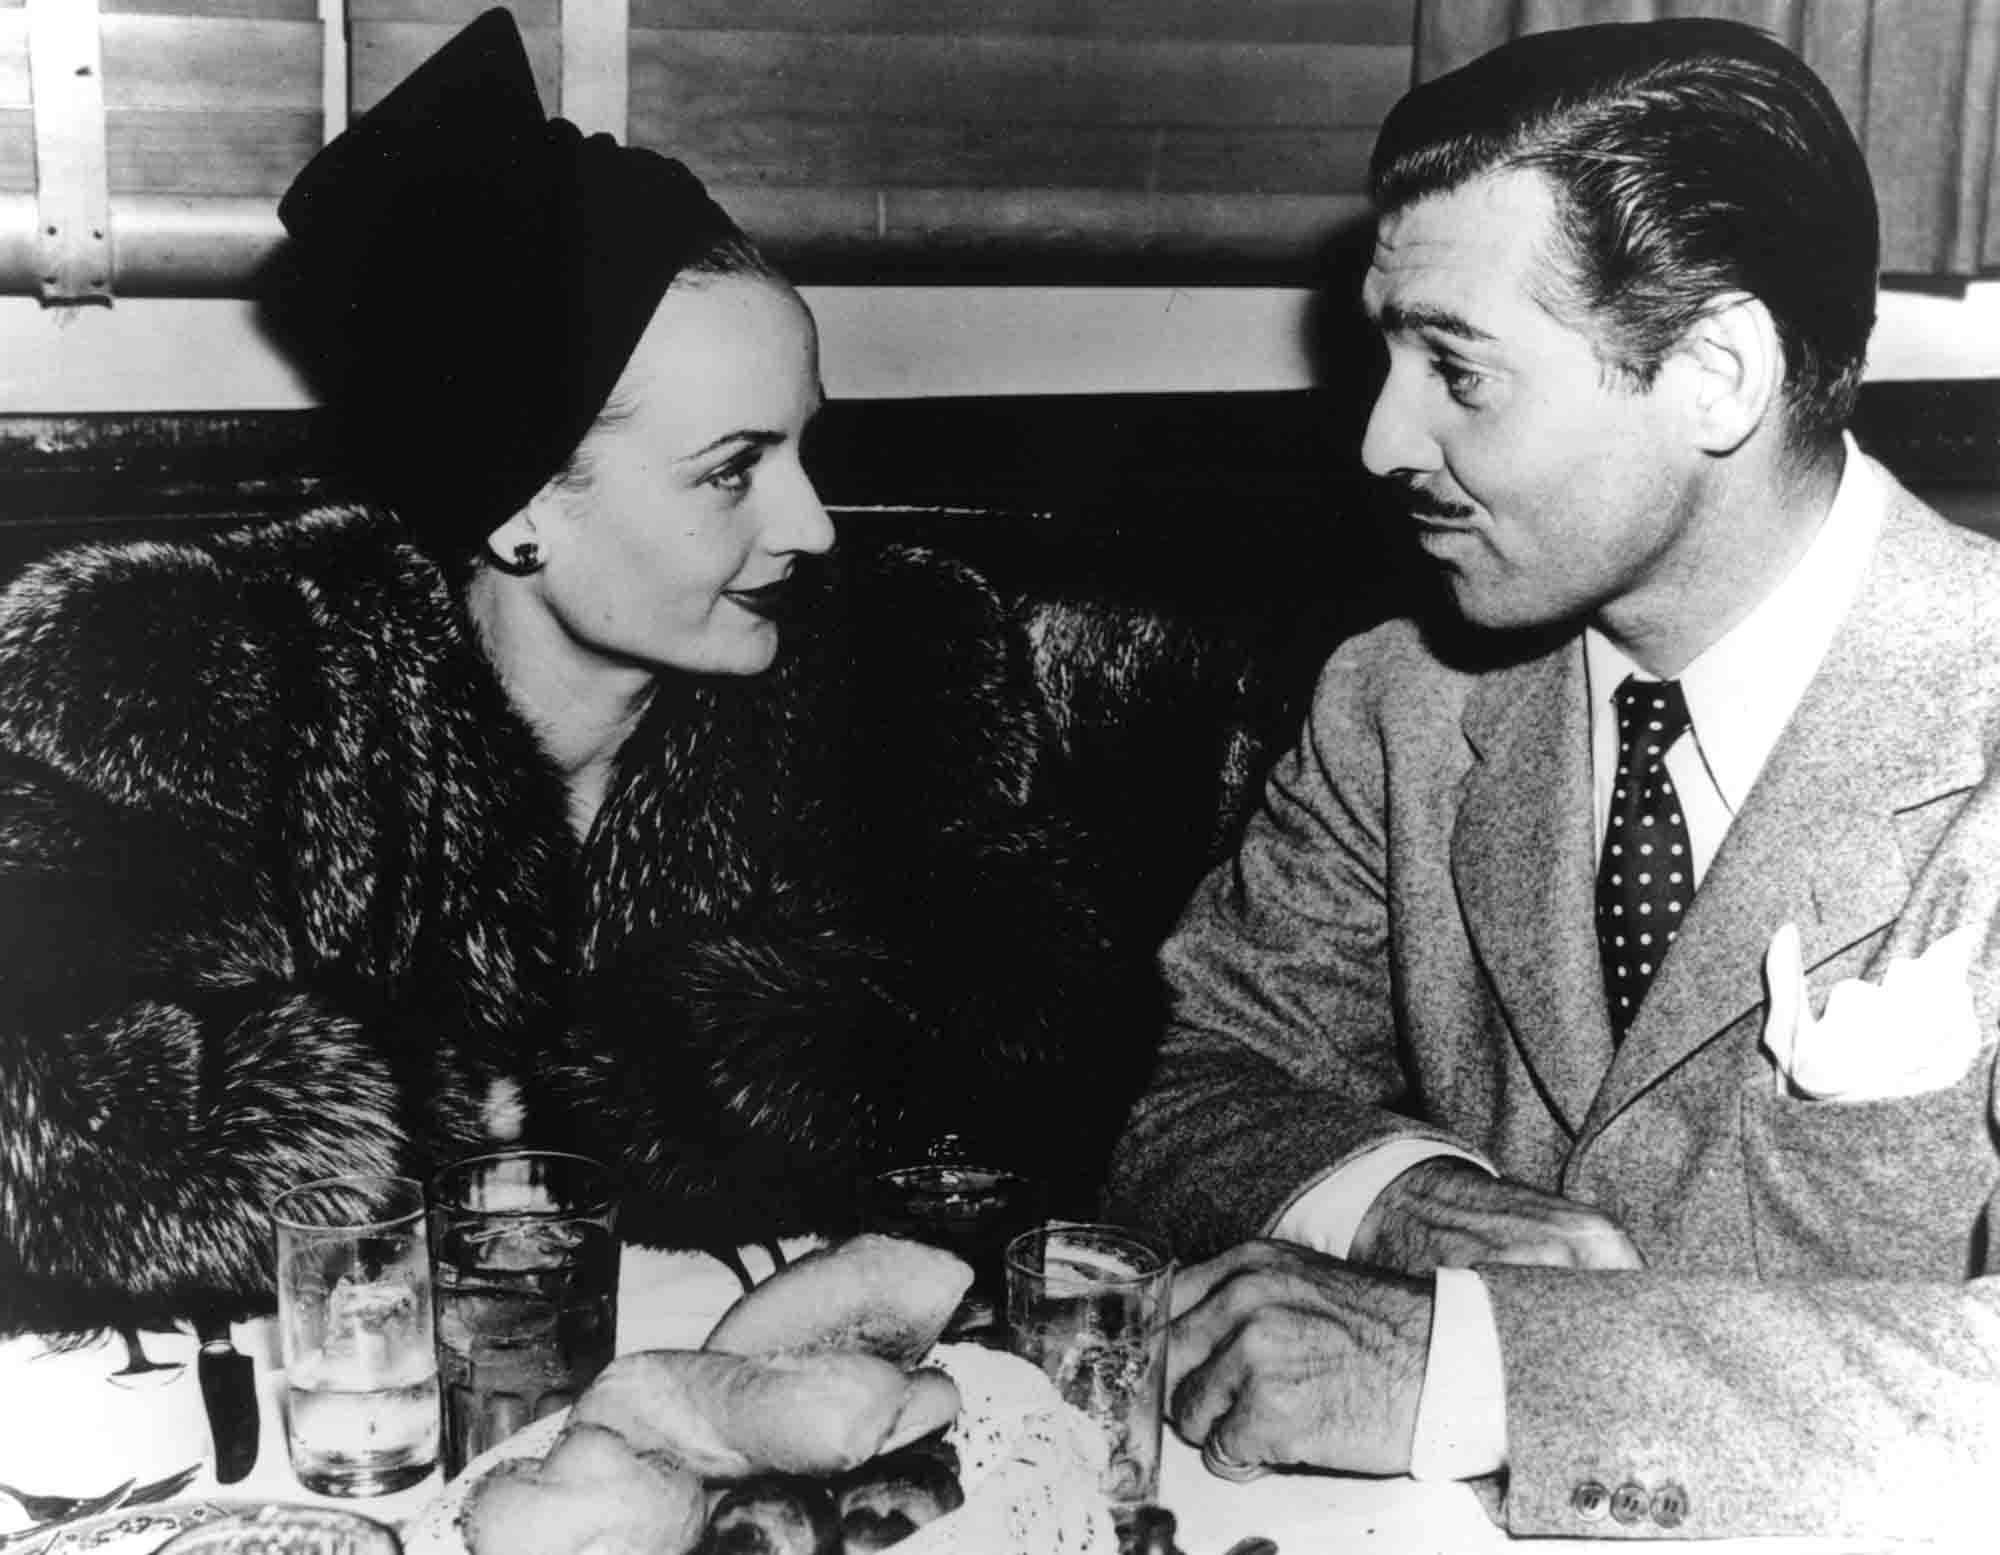 Vintage photo of Clark Gable & Carole Lombard